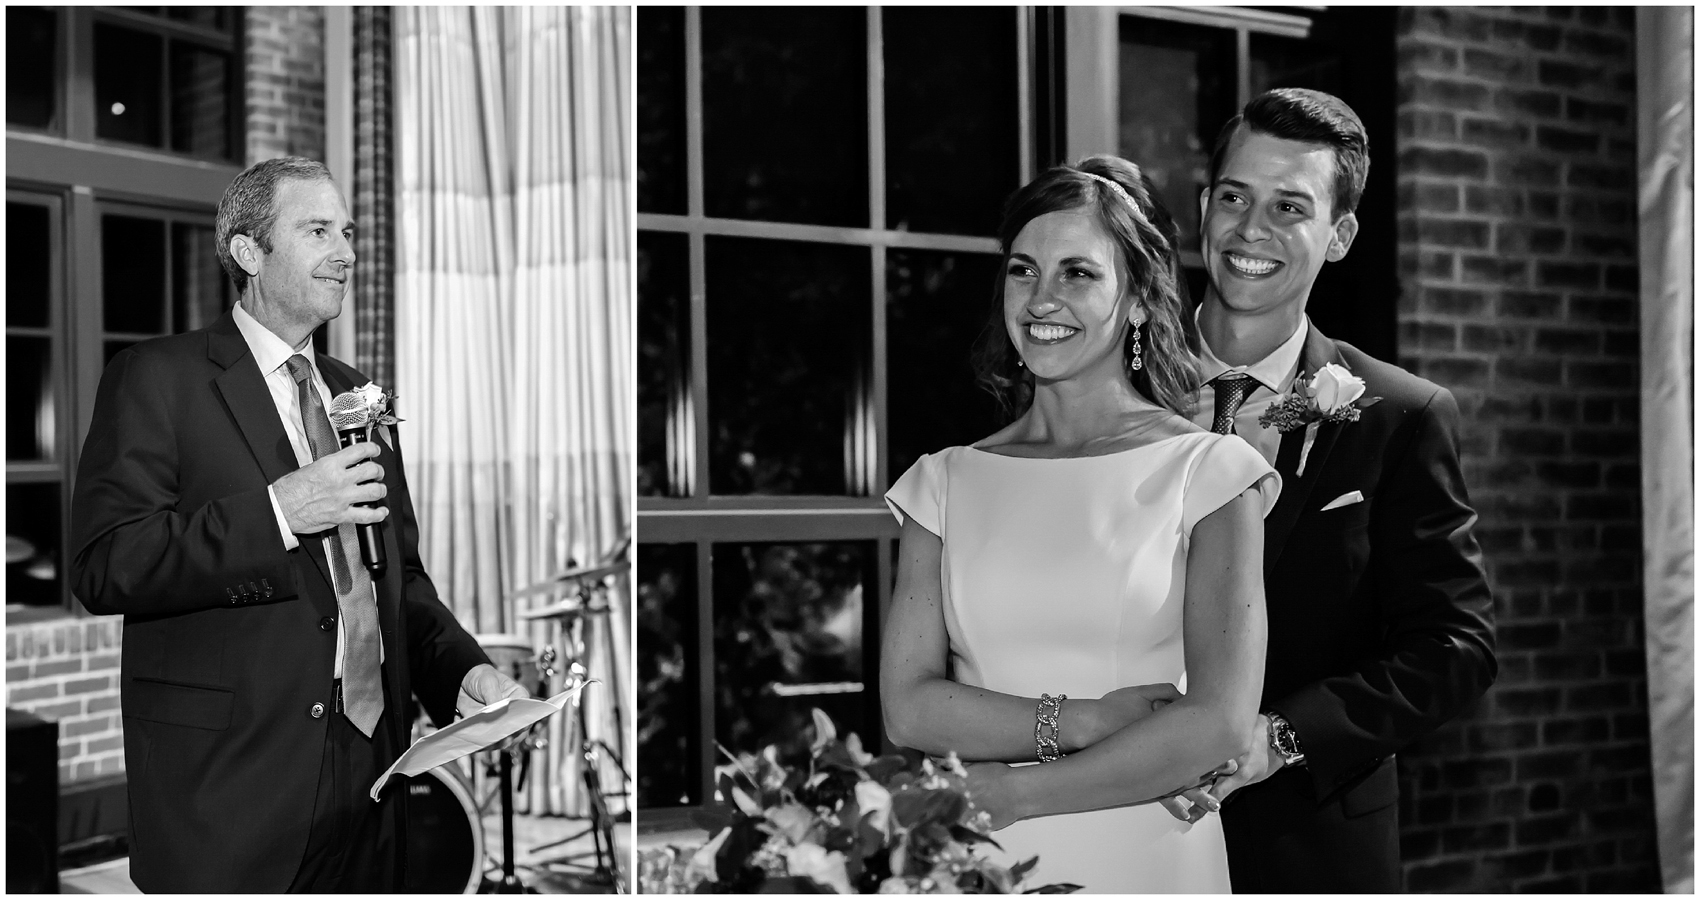 ritz-carlton-georgetown-wedding-washington-dc-photography-liz-stewart-photo-00048